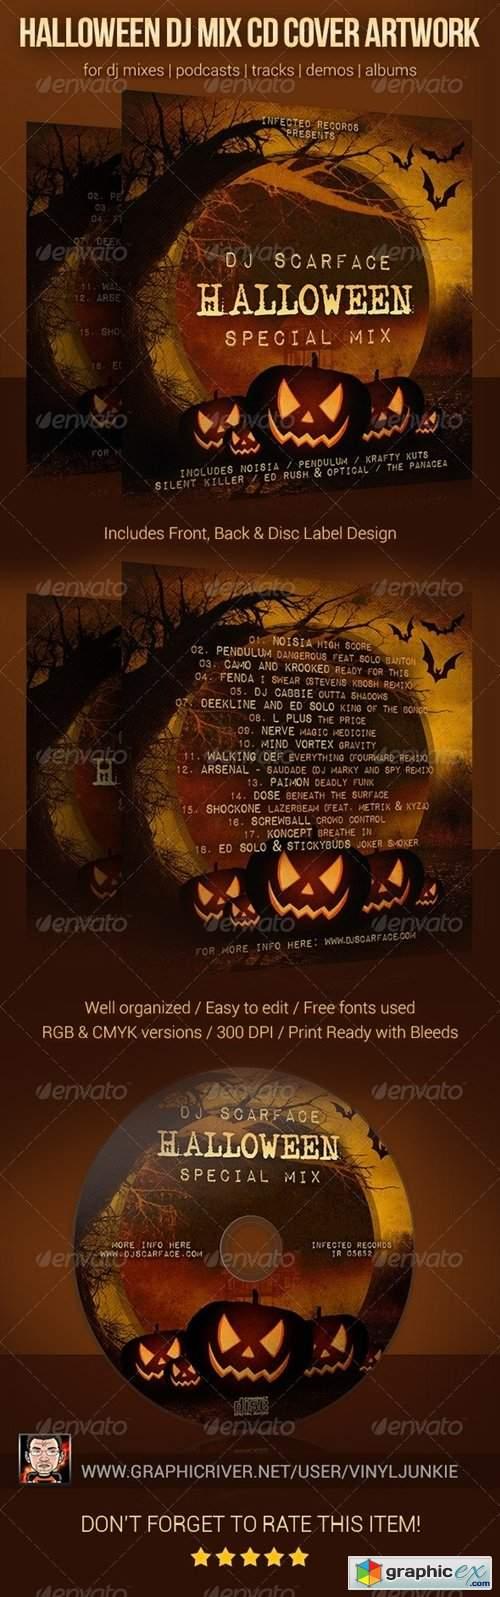 Halloween DJ Mix CD Cover Artwork Template